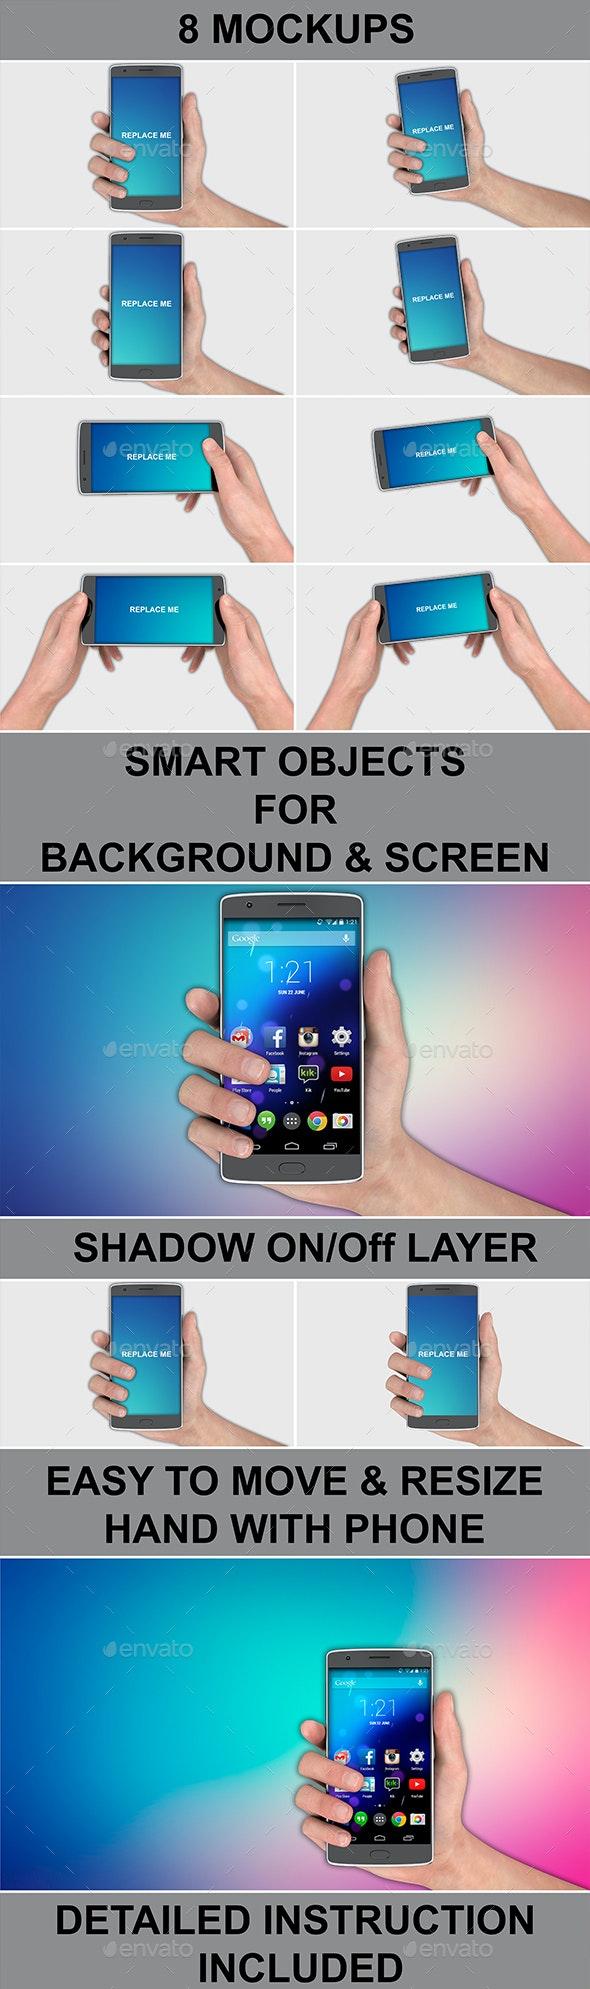 Smartphone In Hand 8 Mockups Pack - Mobile Displays